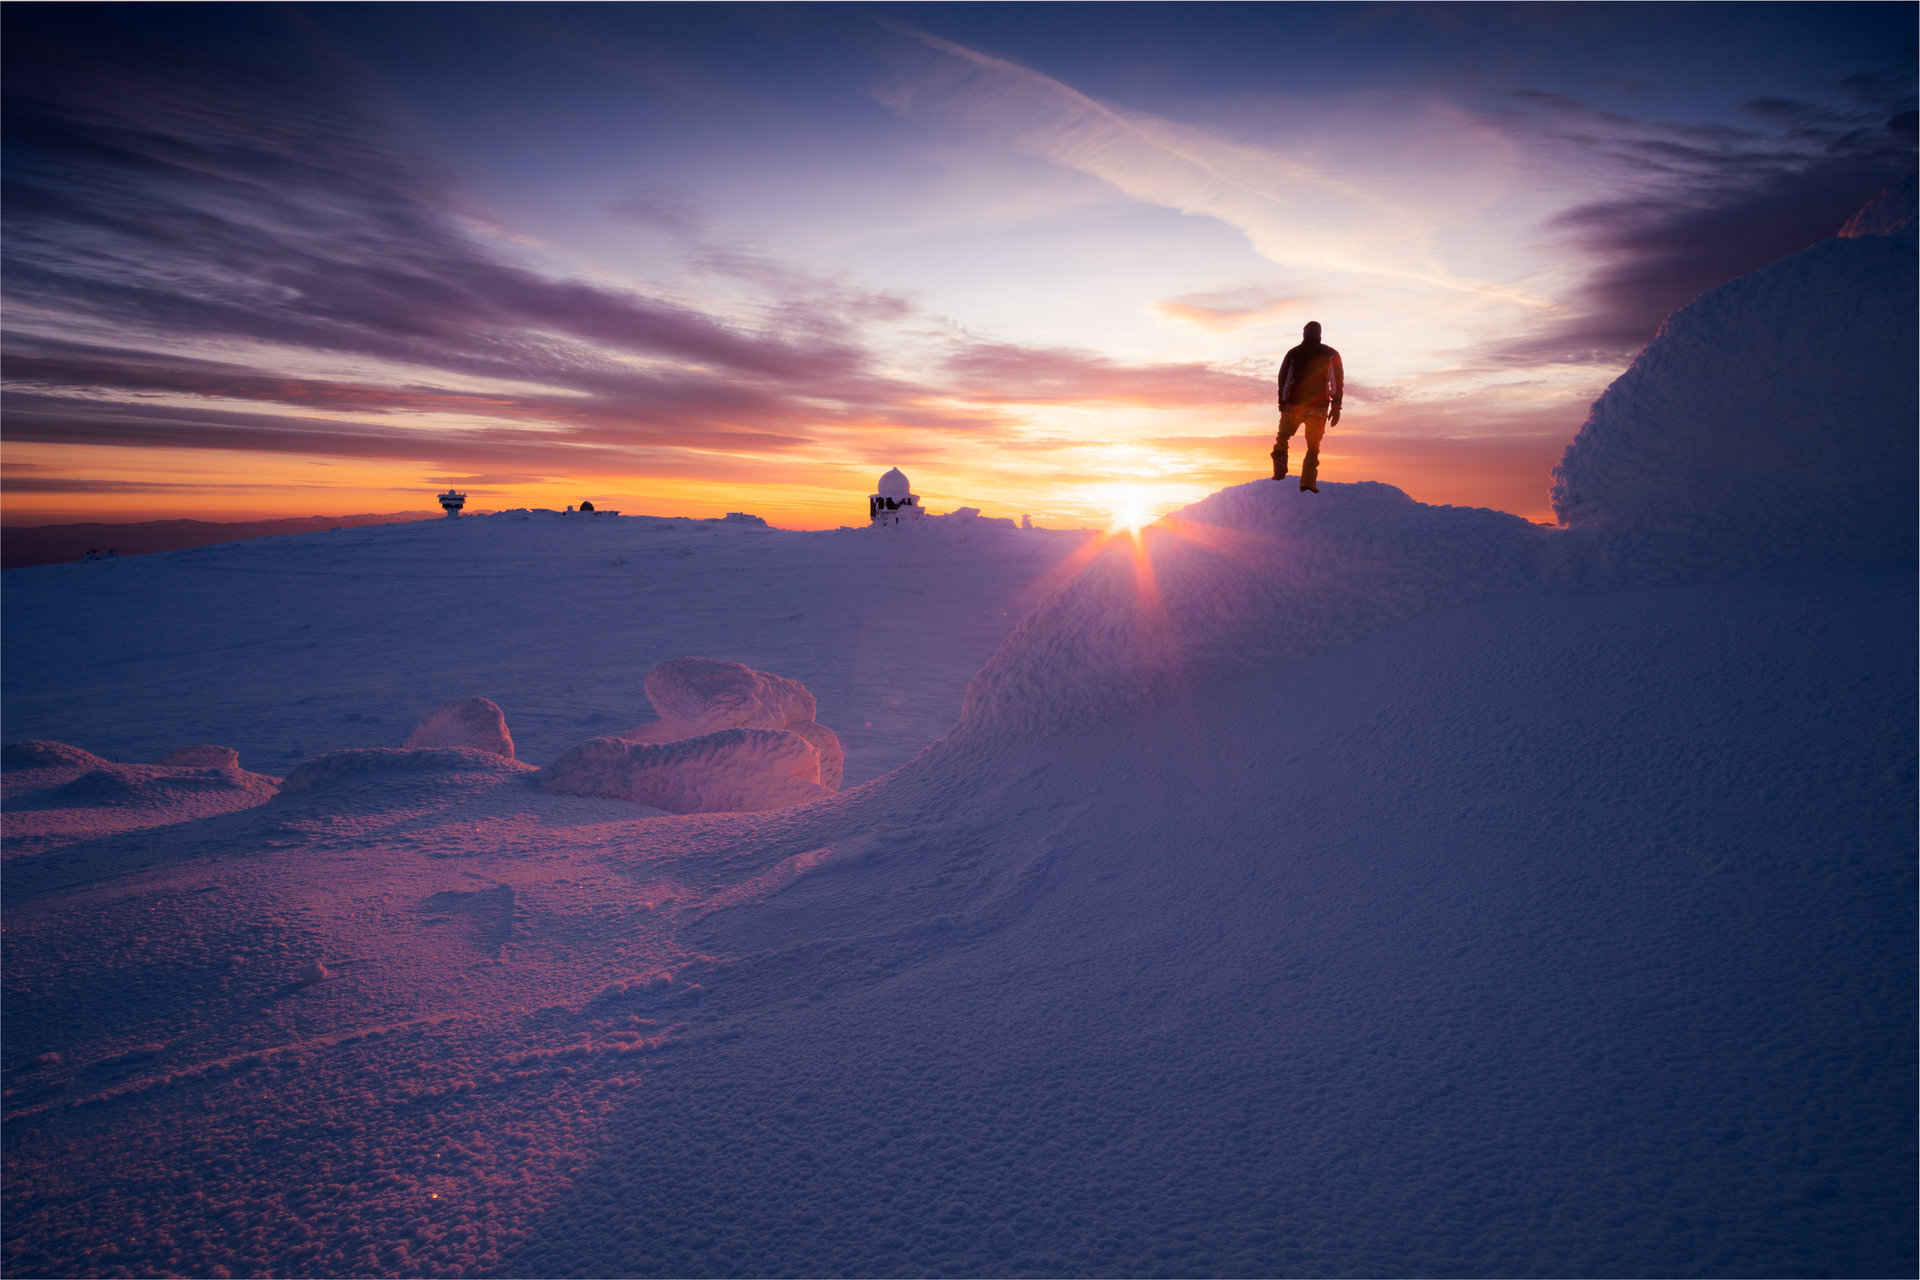 Photo in Landscape | Author David Kirilov - Dido99 | PHOTO FORUM